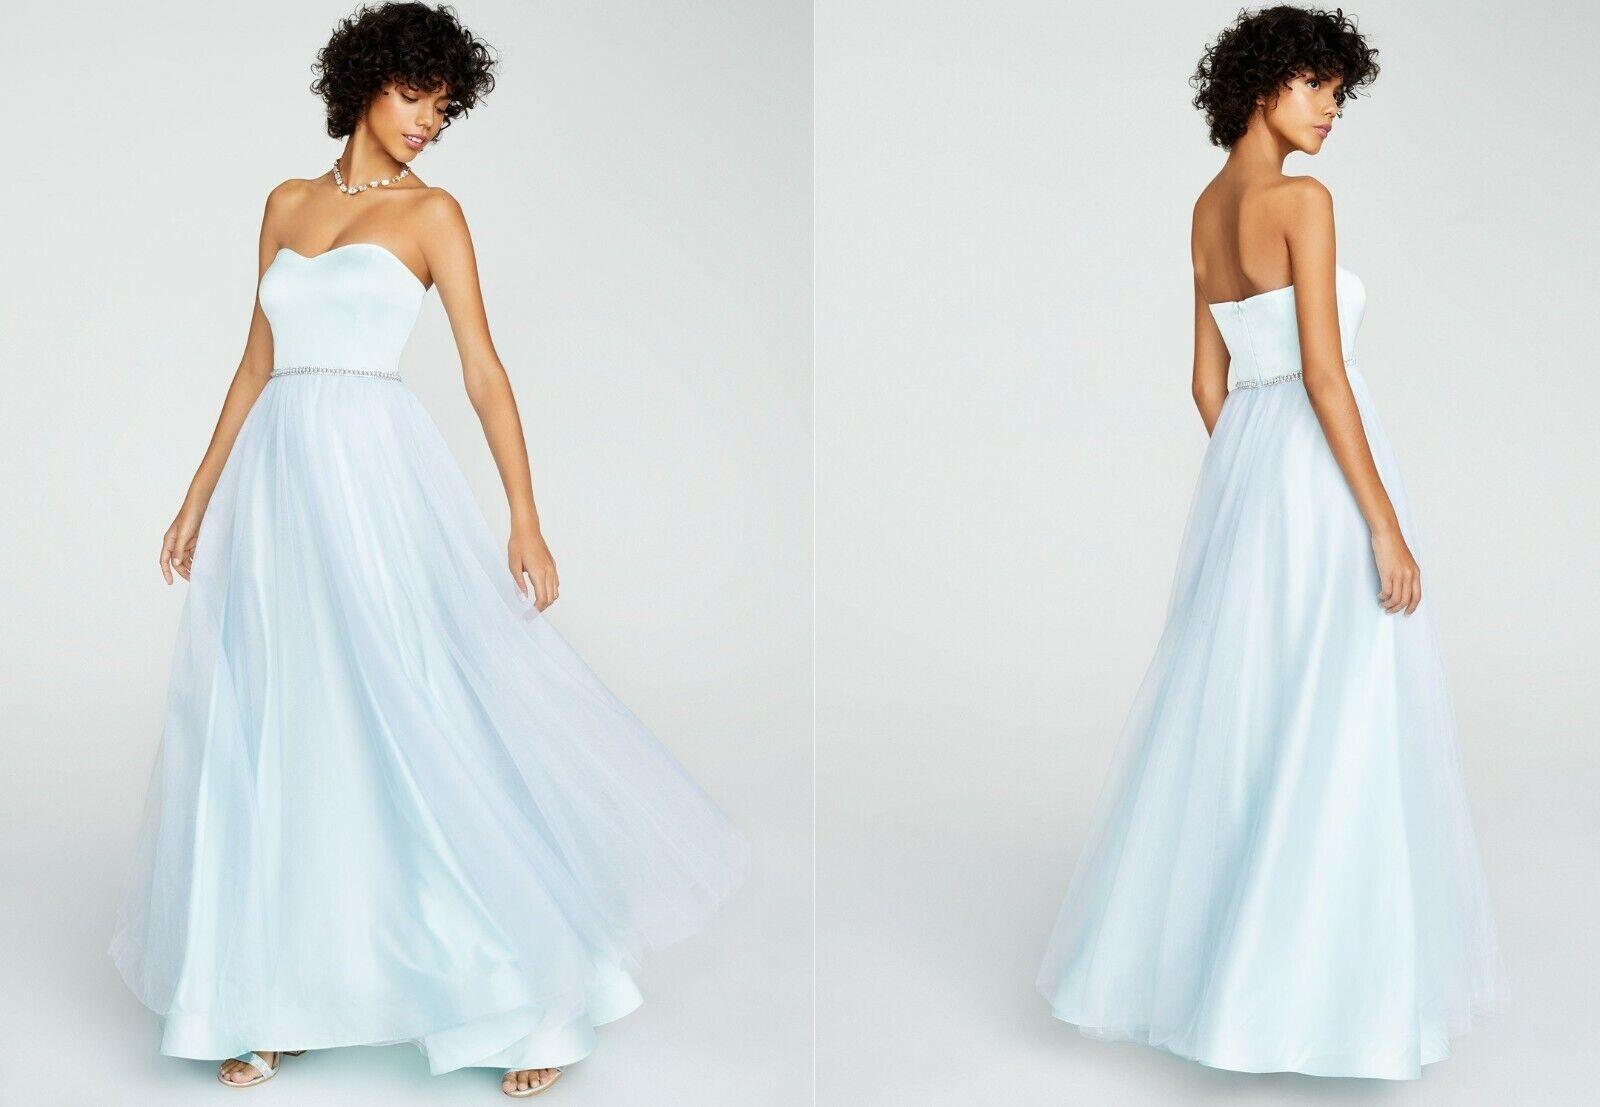 new BETSEY JOHNSON light teal blue STRAPLESS GLITTER TULLE GOWN sz 6 prom dress